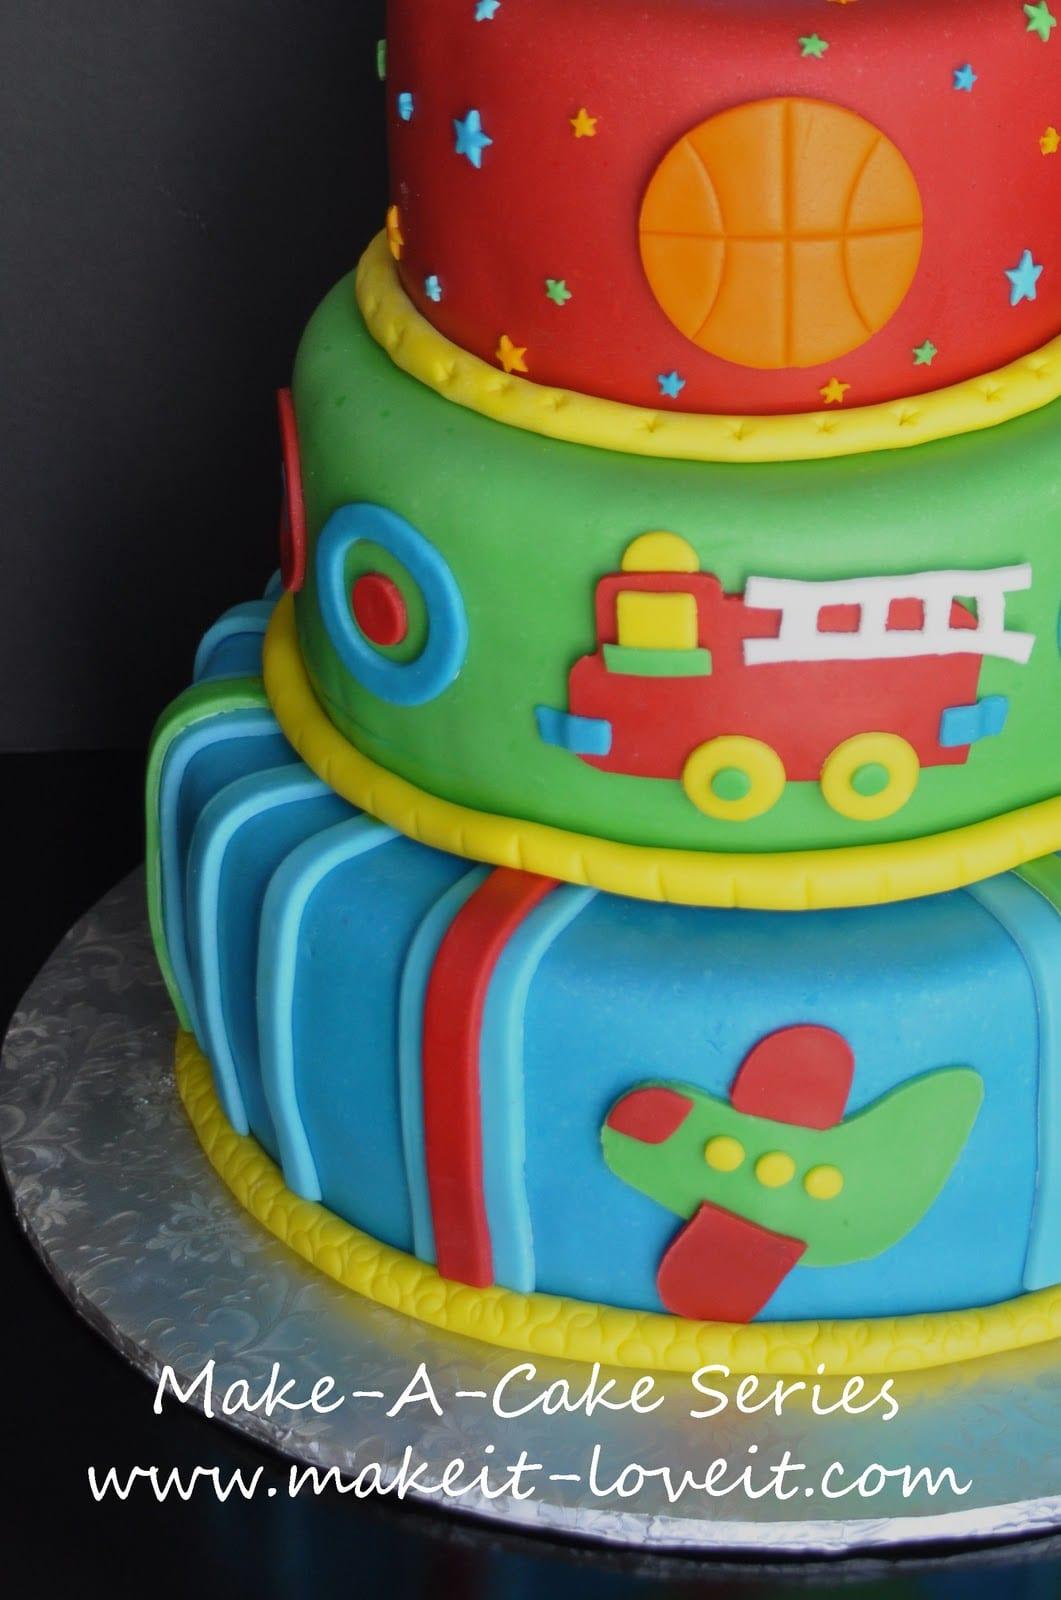 Make-a-Cake Series: Borders